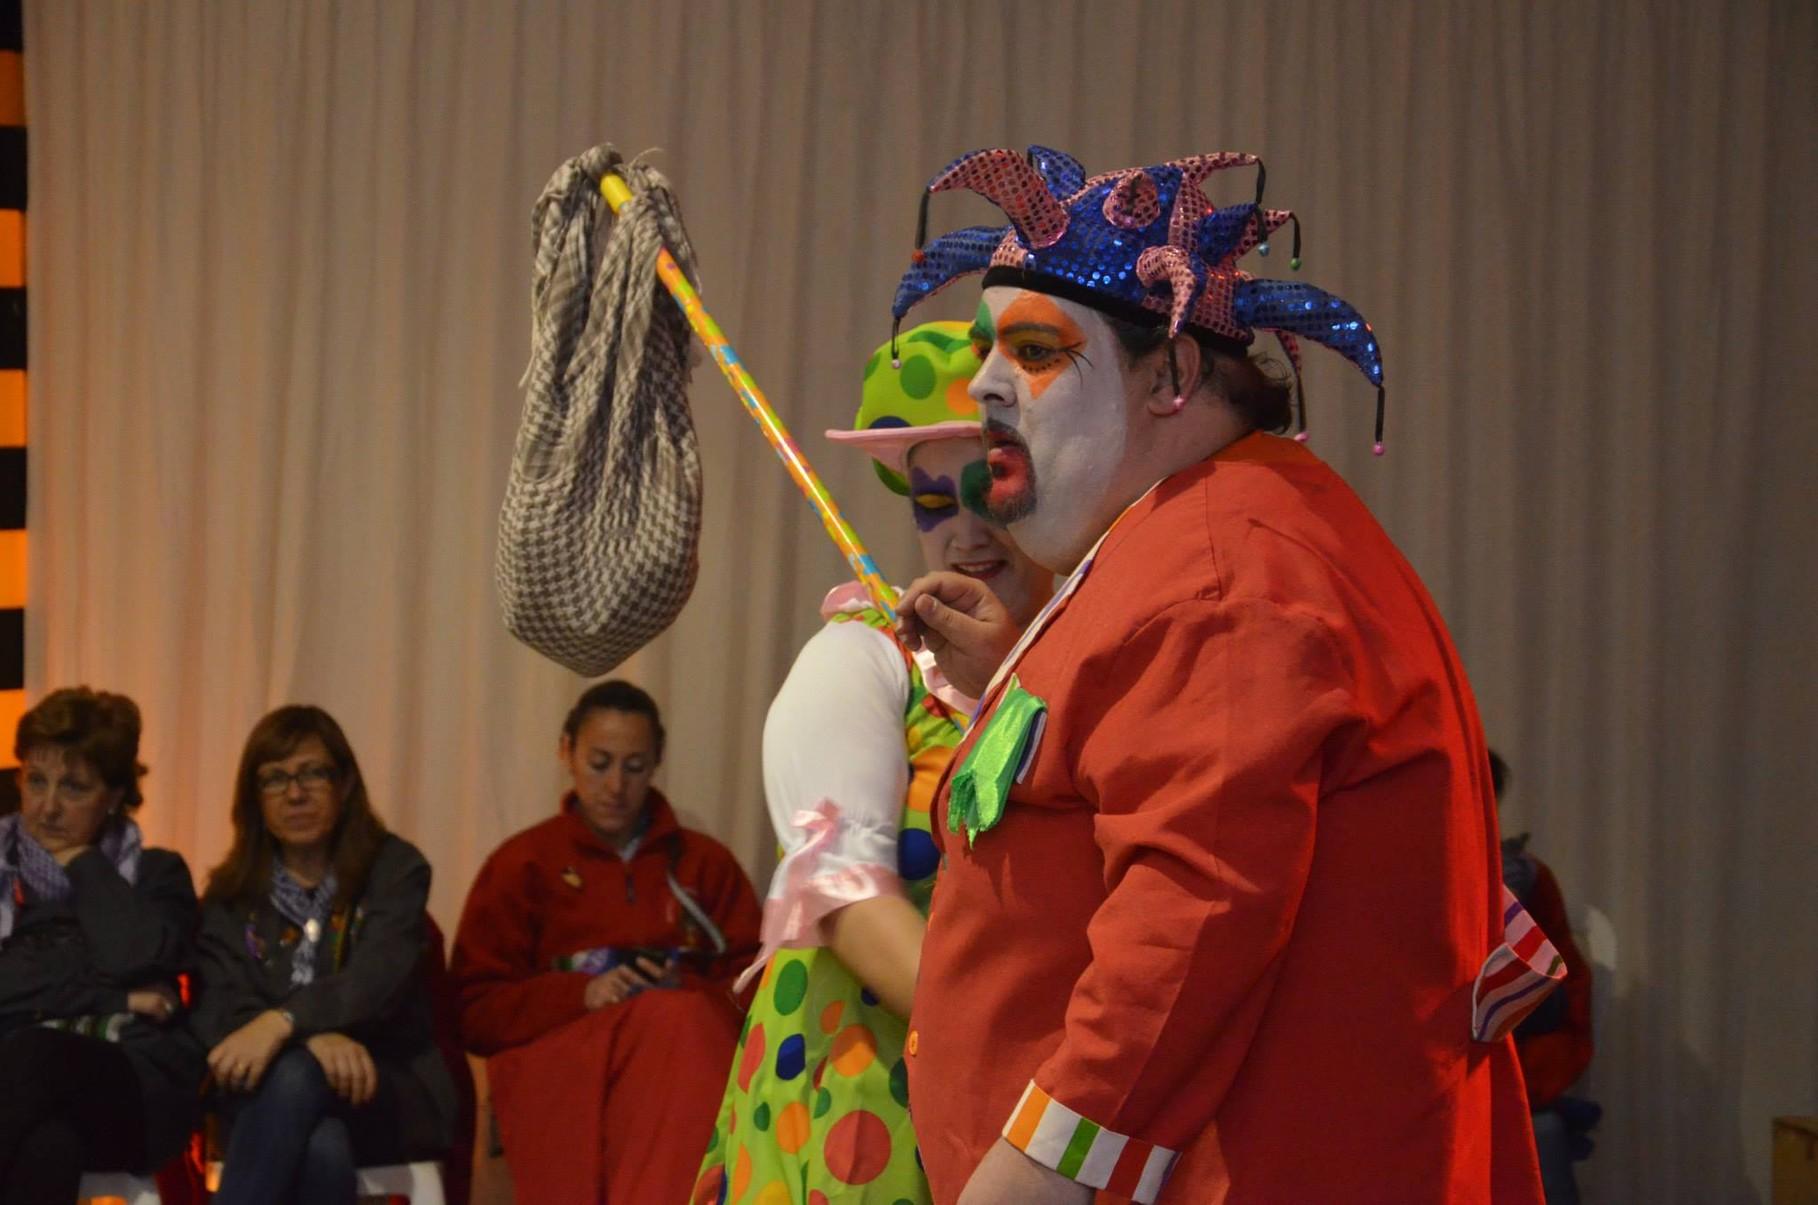 16-03-2014. Merienda infantil. Espectáculo. Carlota y Pelotín.